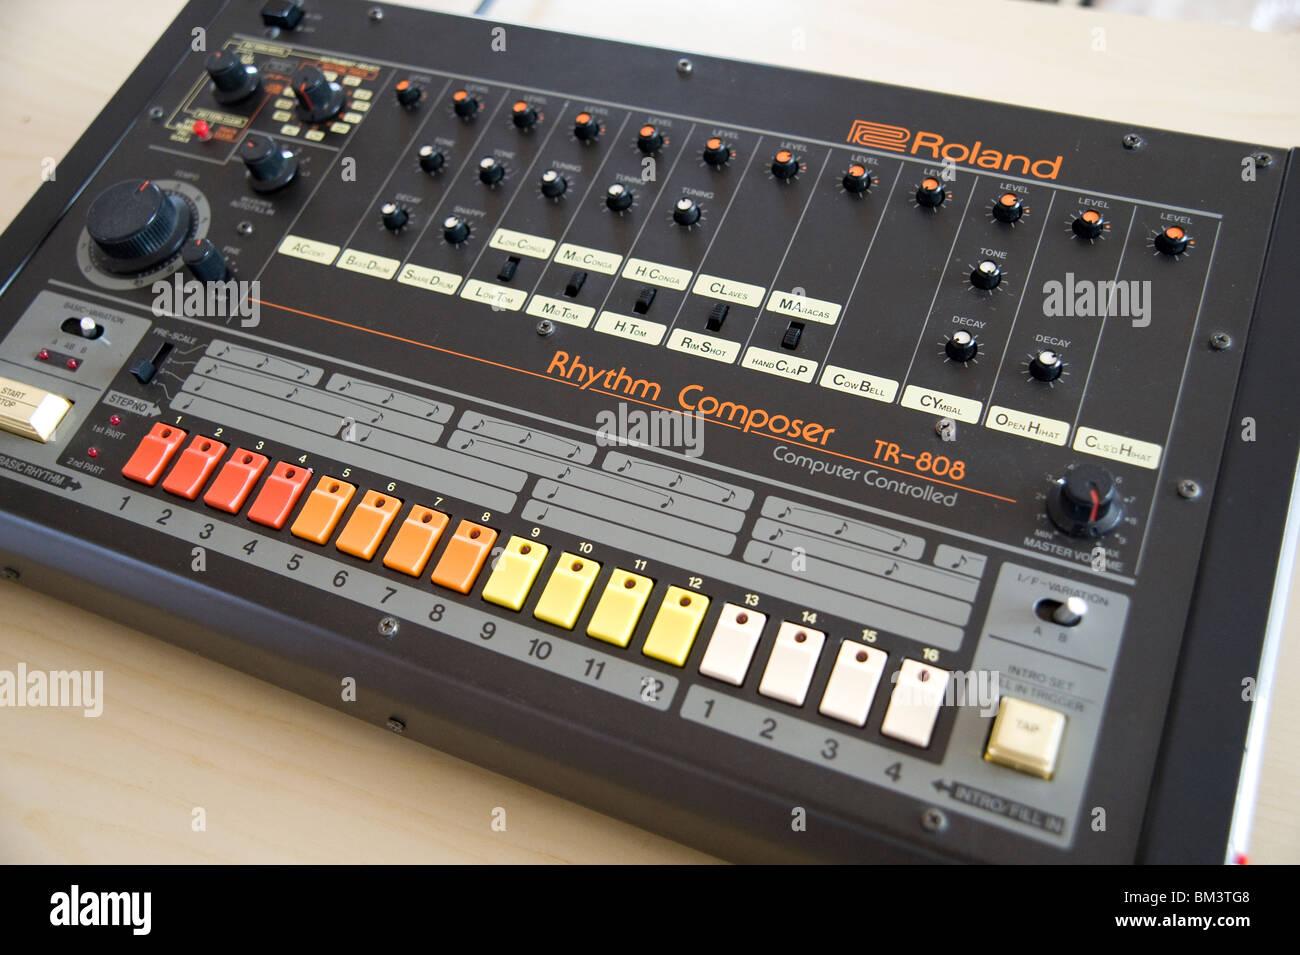 The Roland TR 808 analogue drum machine - Stock Image